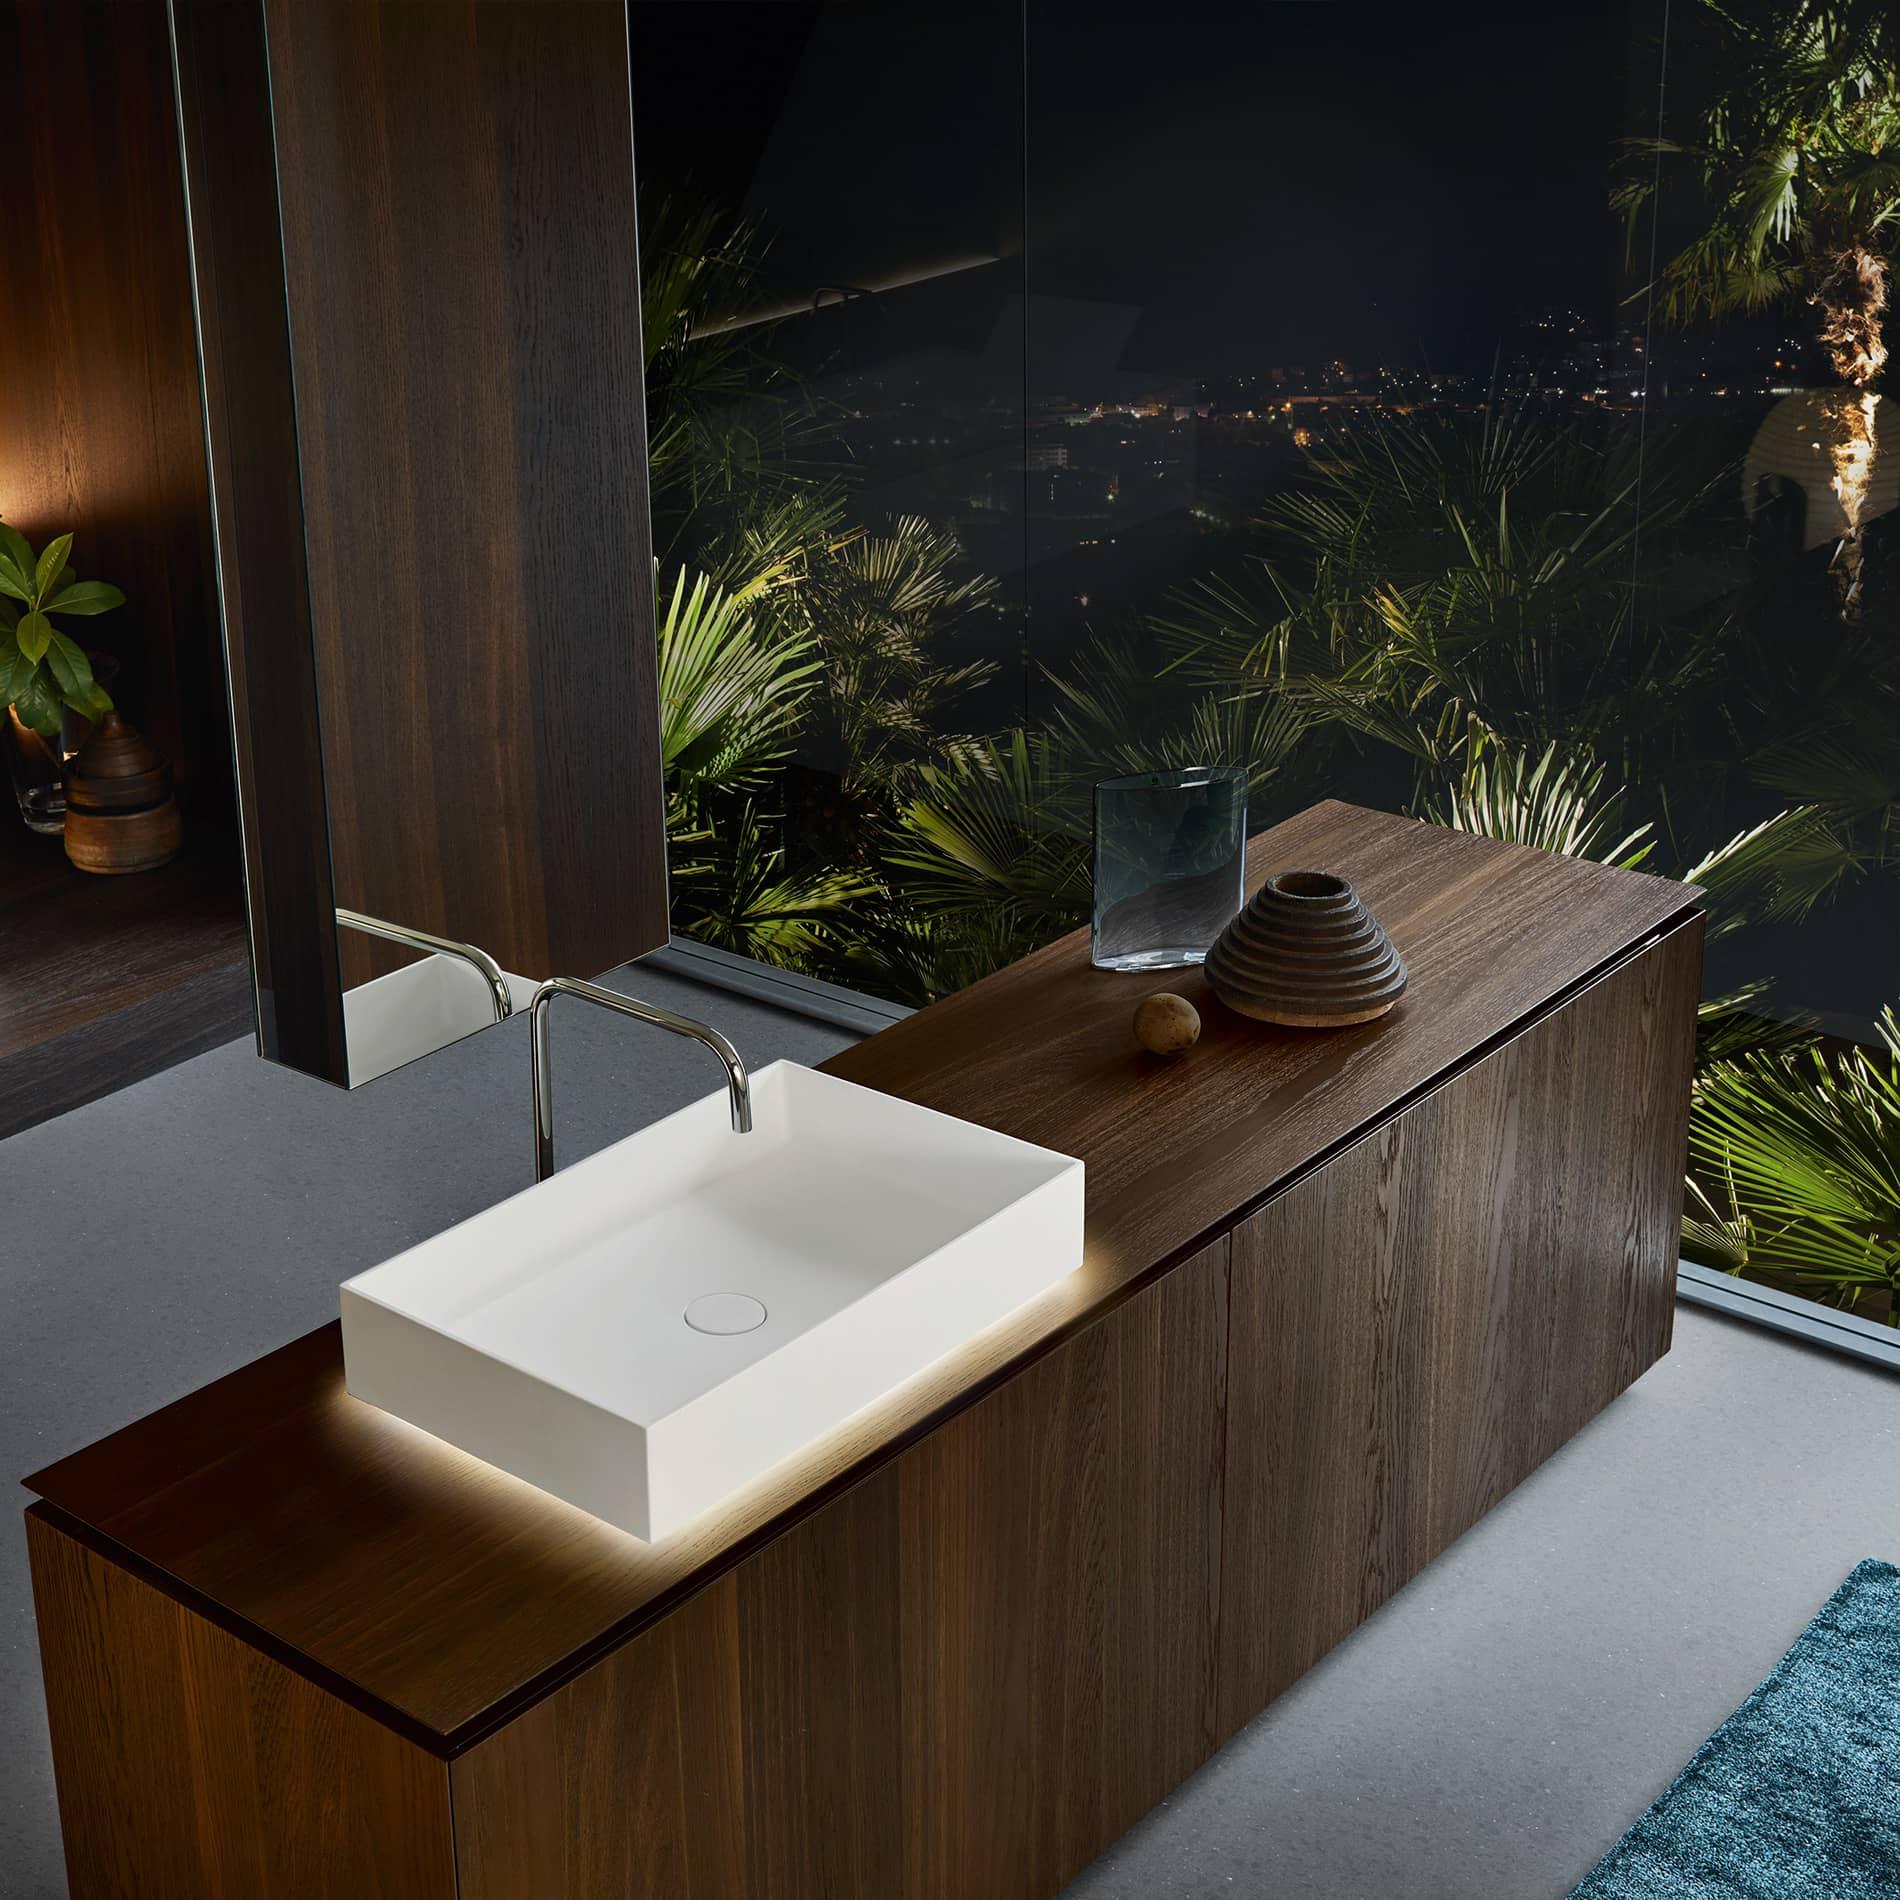 Cristalplant-products-Milldue-washbasins-3